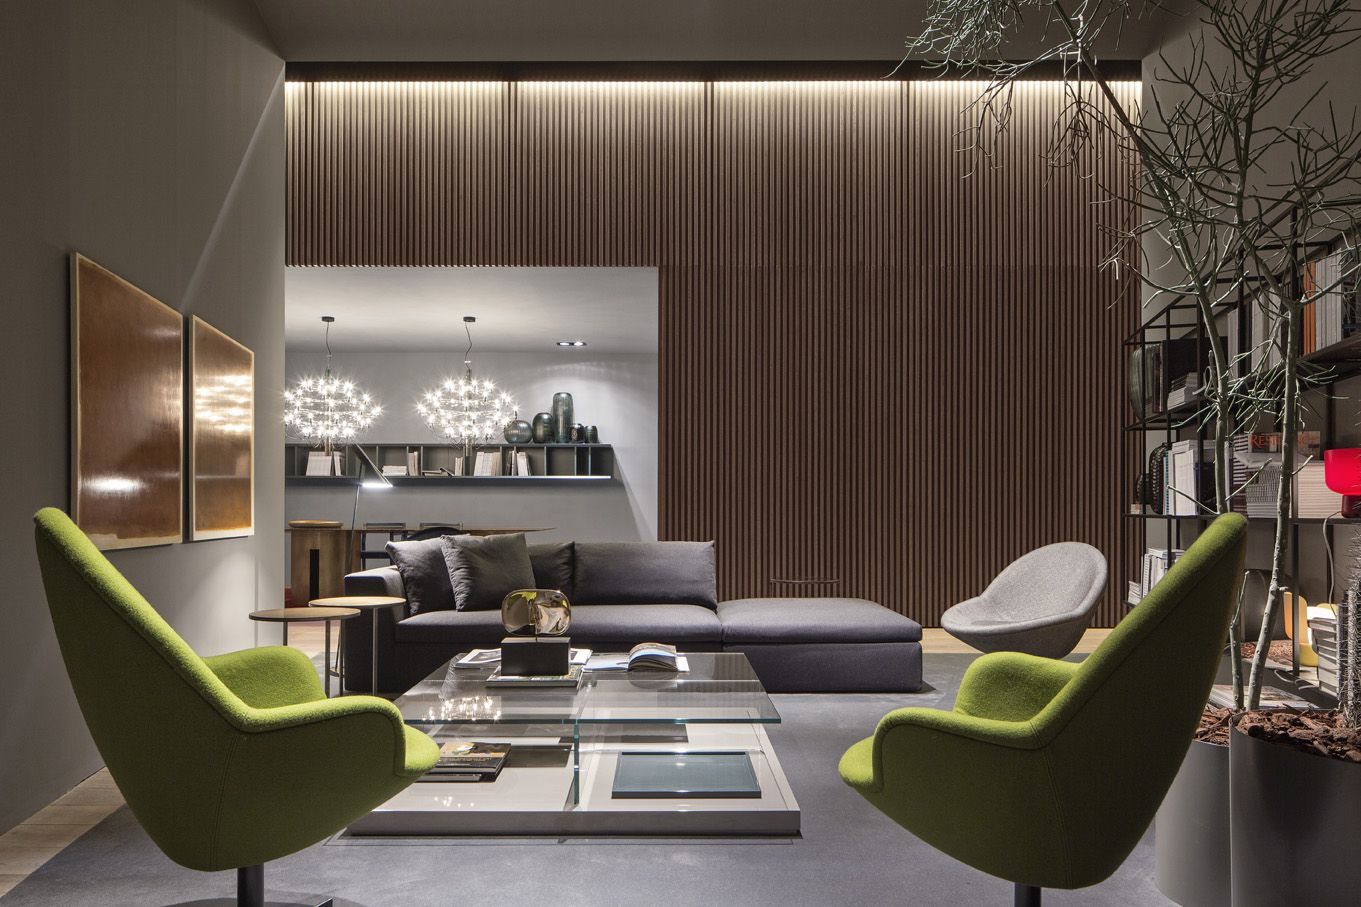 MERIDIANI I  modular sofa I armchairs I low table i wall units